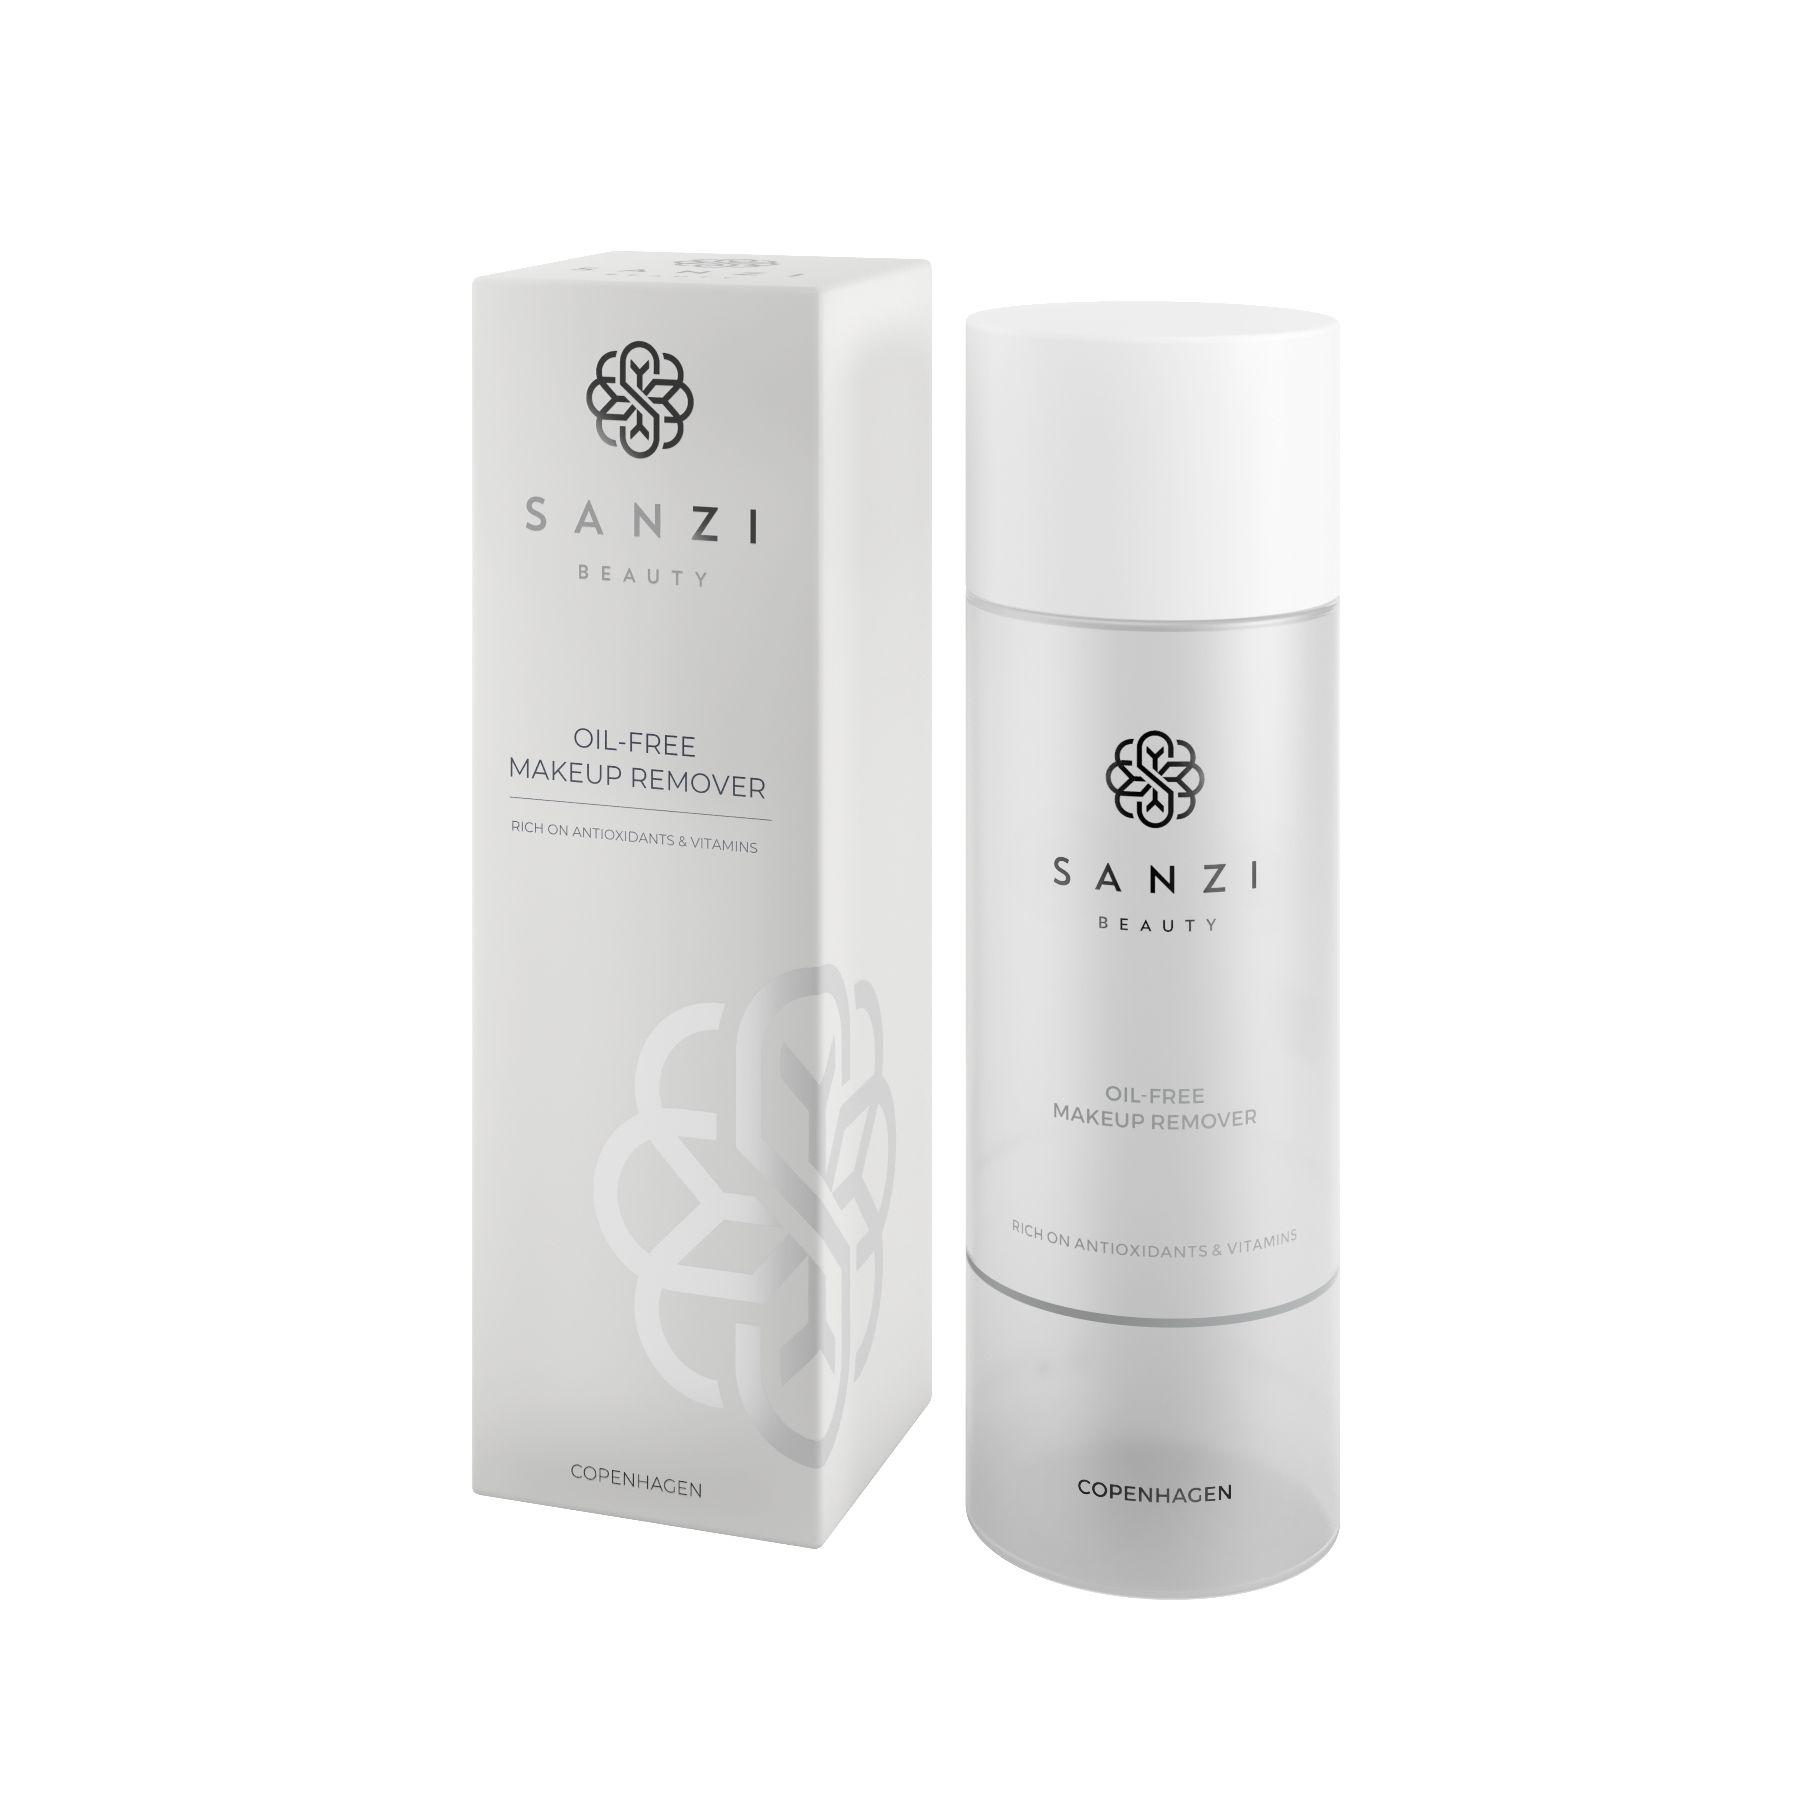 Sanzi Beauty Oil-Free Makeup Remover, 120 ml